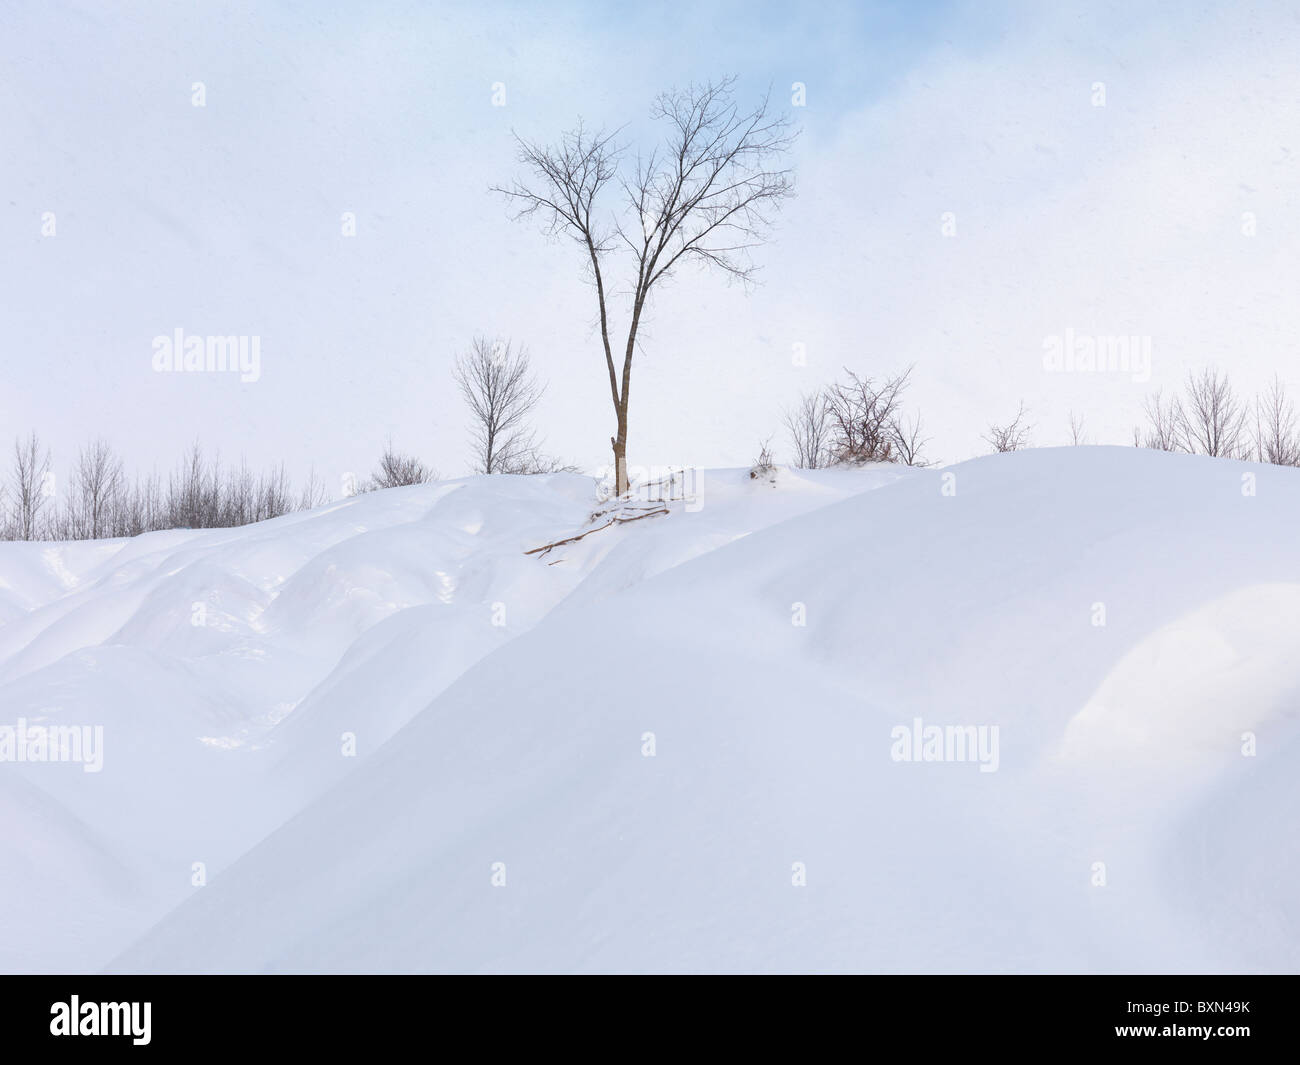 Snow dunes under blue sky. Wintertime scenic. Ontario, Canada. - Stock Image